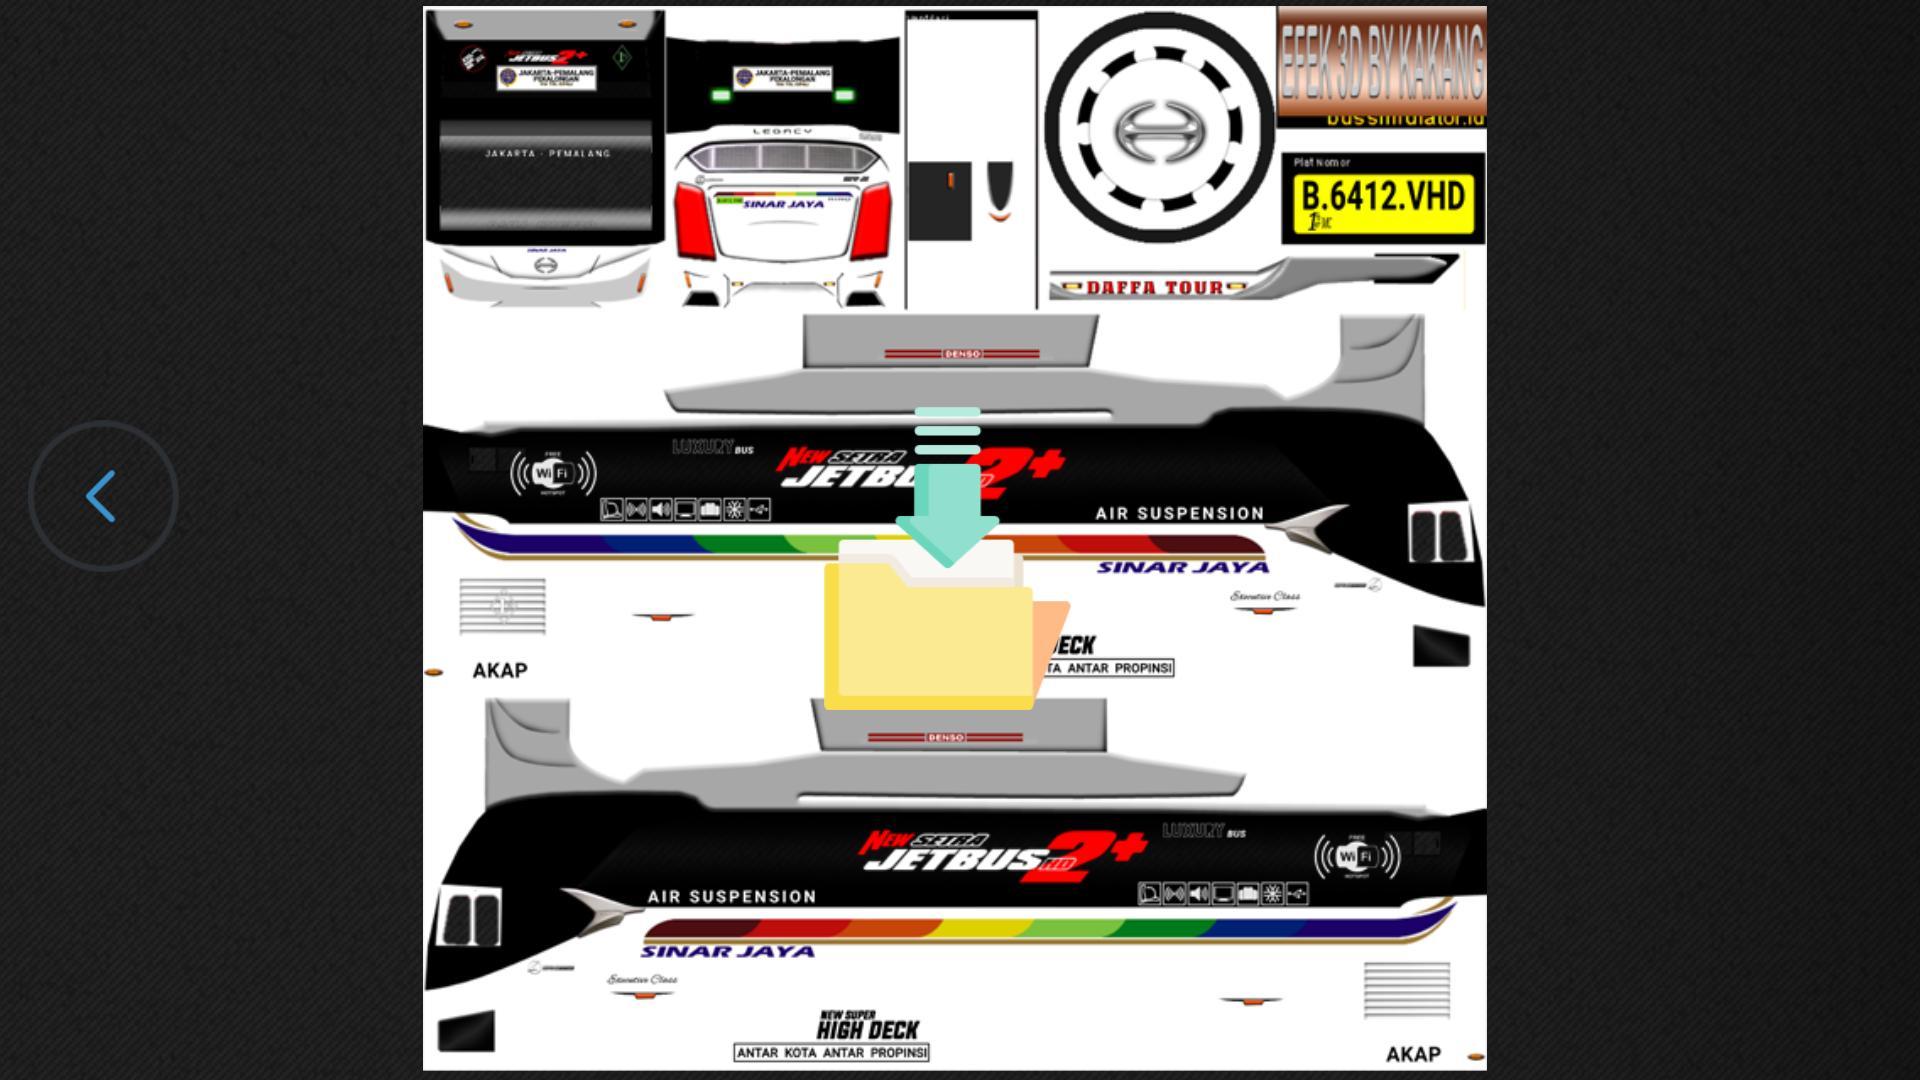 Download Livery Bus Shd Sinar Jaya